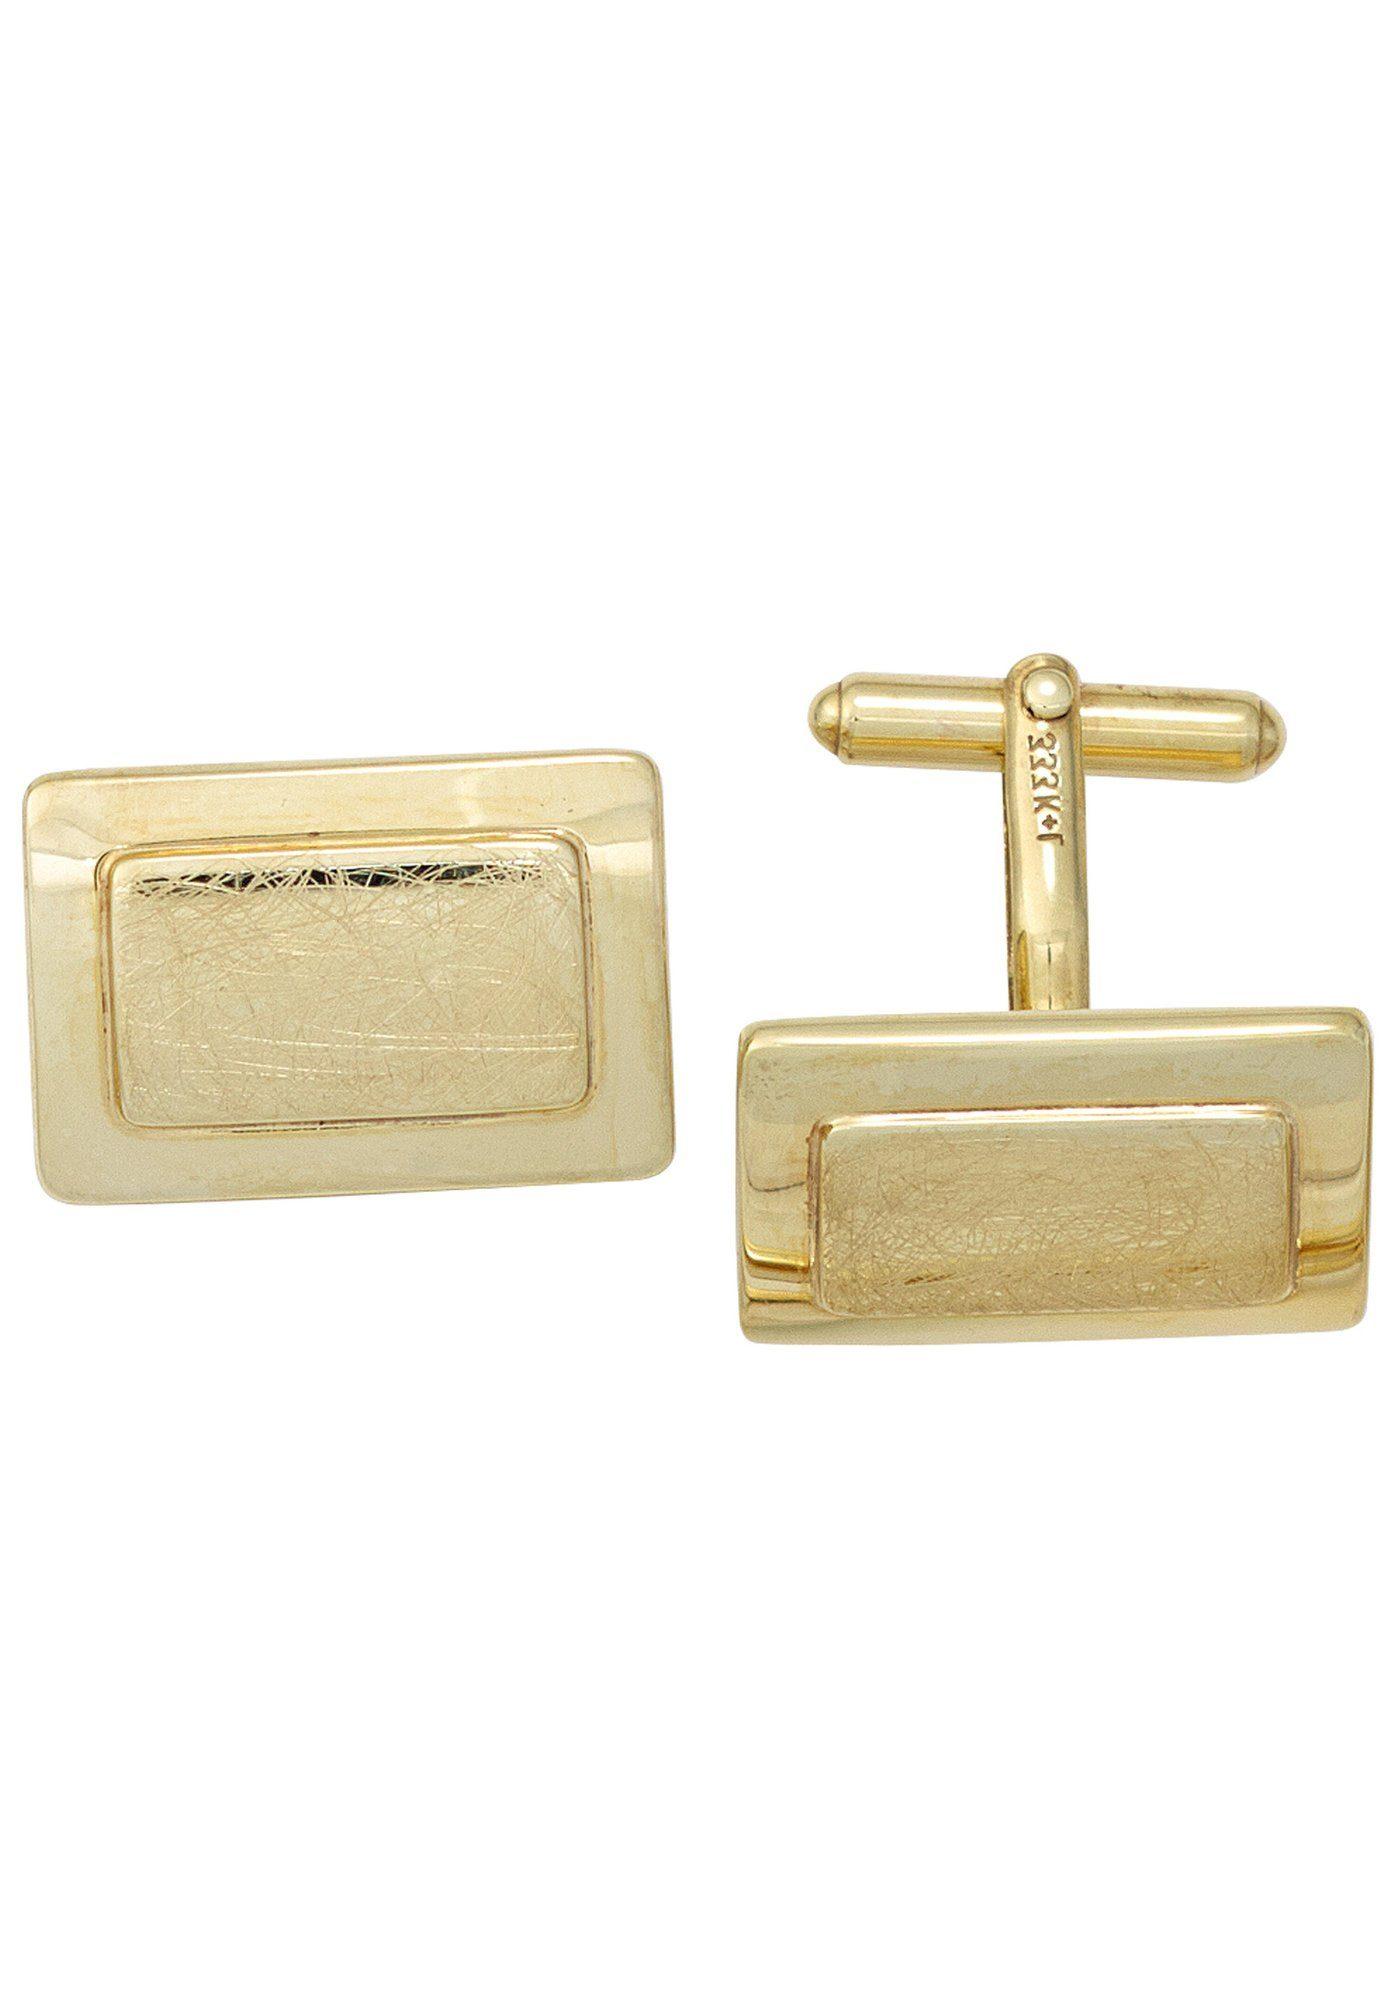 JOBO Manschettenknöpfe 333 Gold